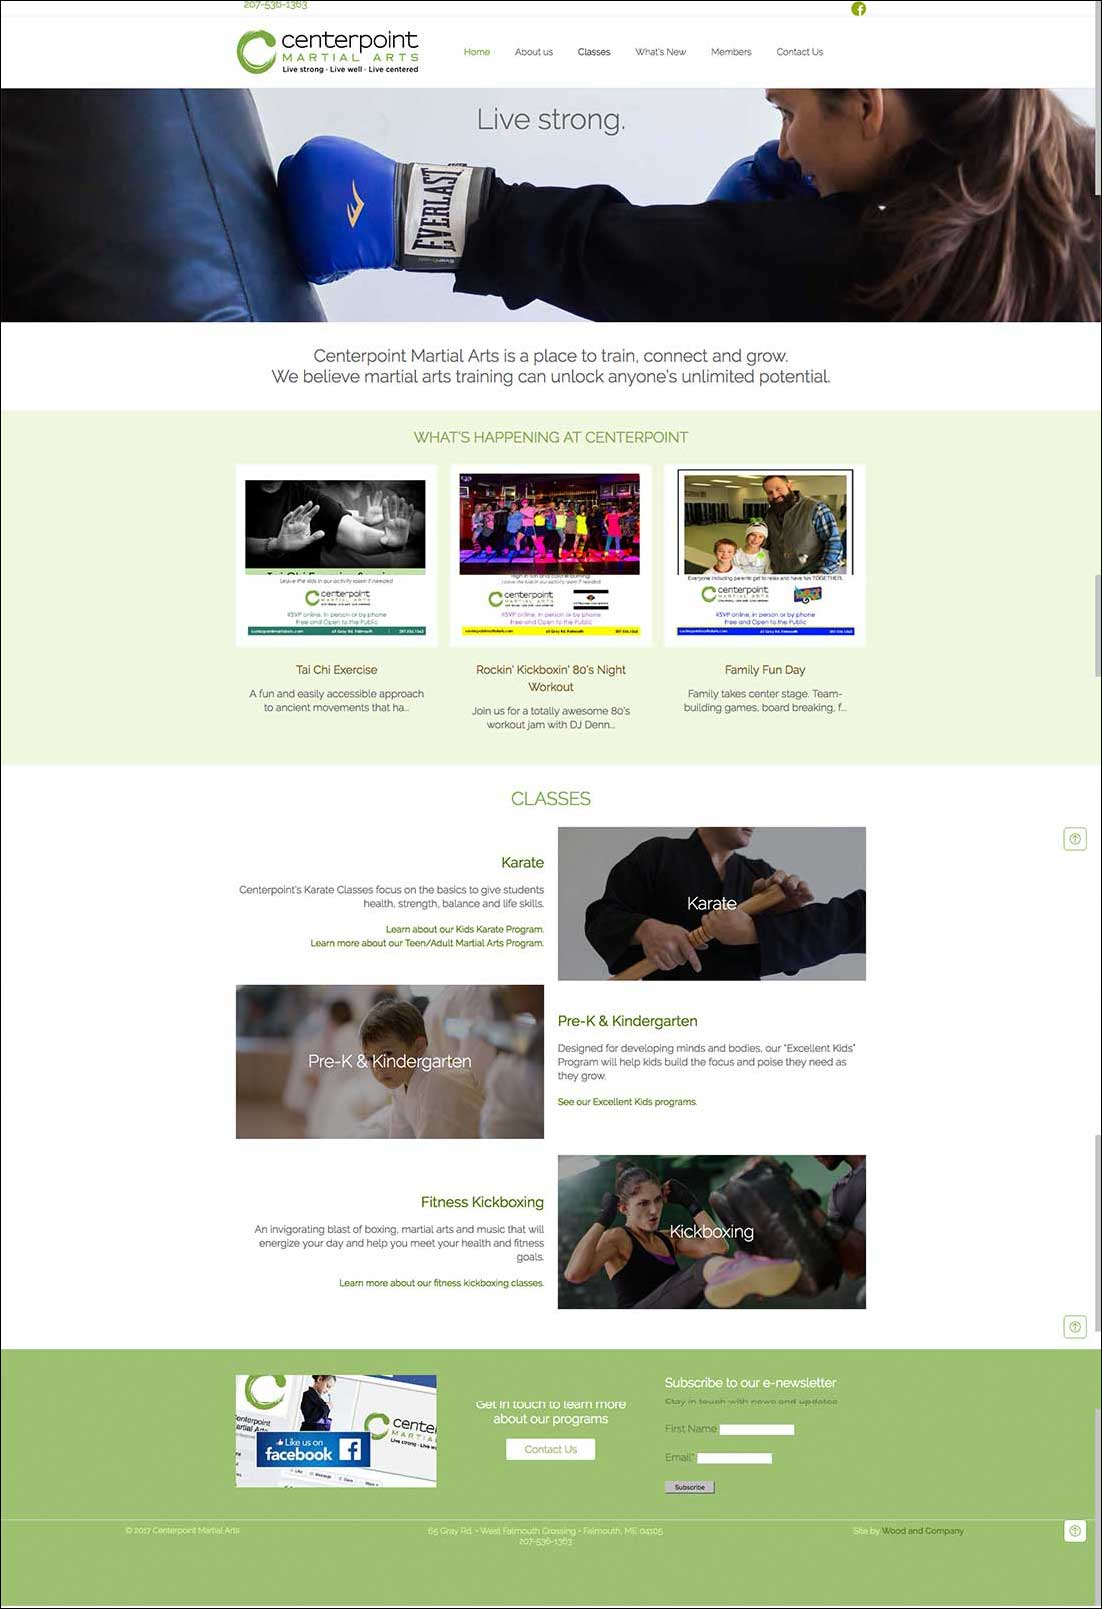 Centerpoint Martial Arts Website